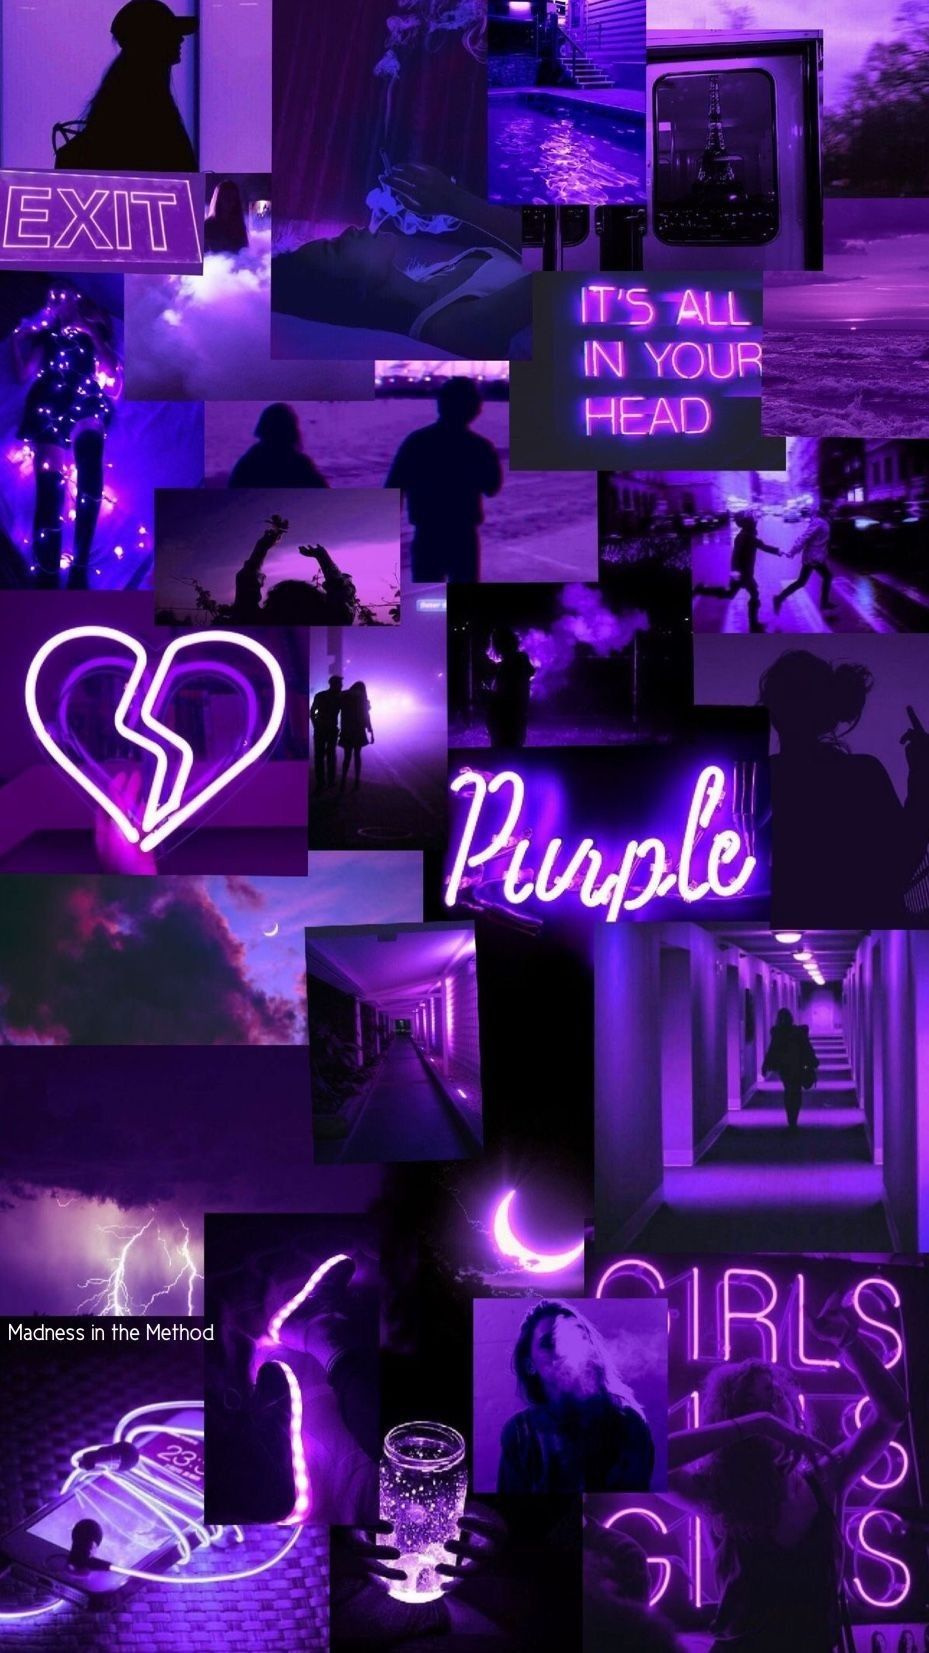 Pin By Lovemusique77 On Fond D Ecran Aesthetic Iphone Wallpaper Iphone Wallpaper Tumblr Aesthetic Purple Wallpaper Phone